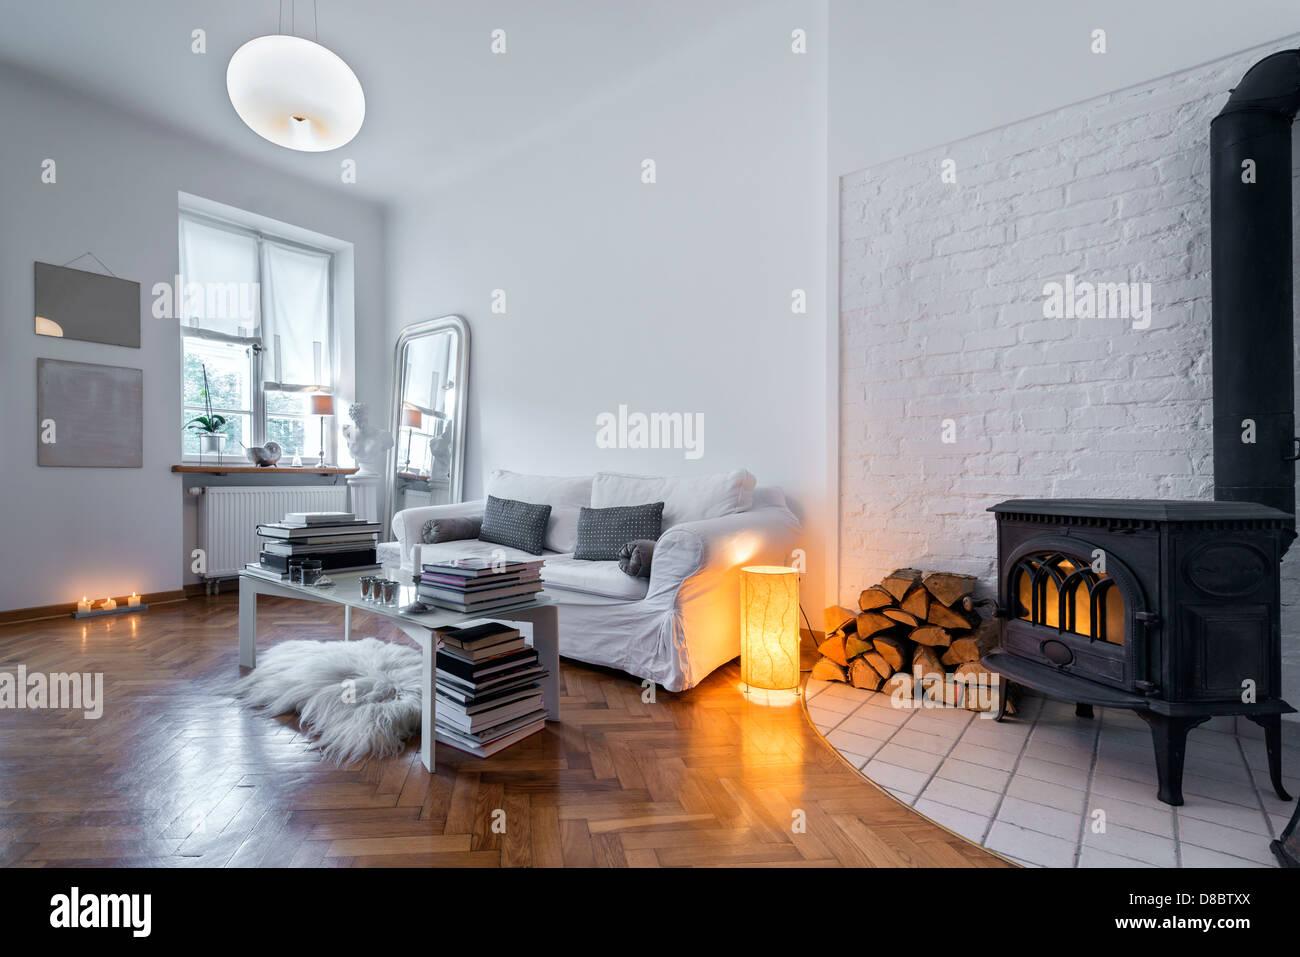 Post diseño interior moderno comedor con chimenea Foto & Imagen De ...